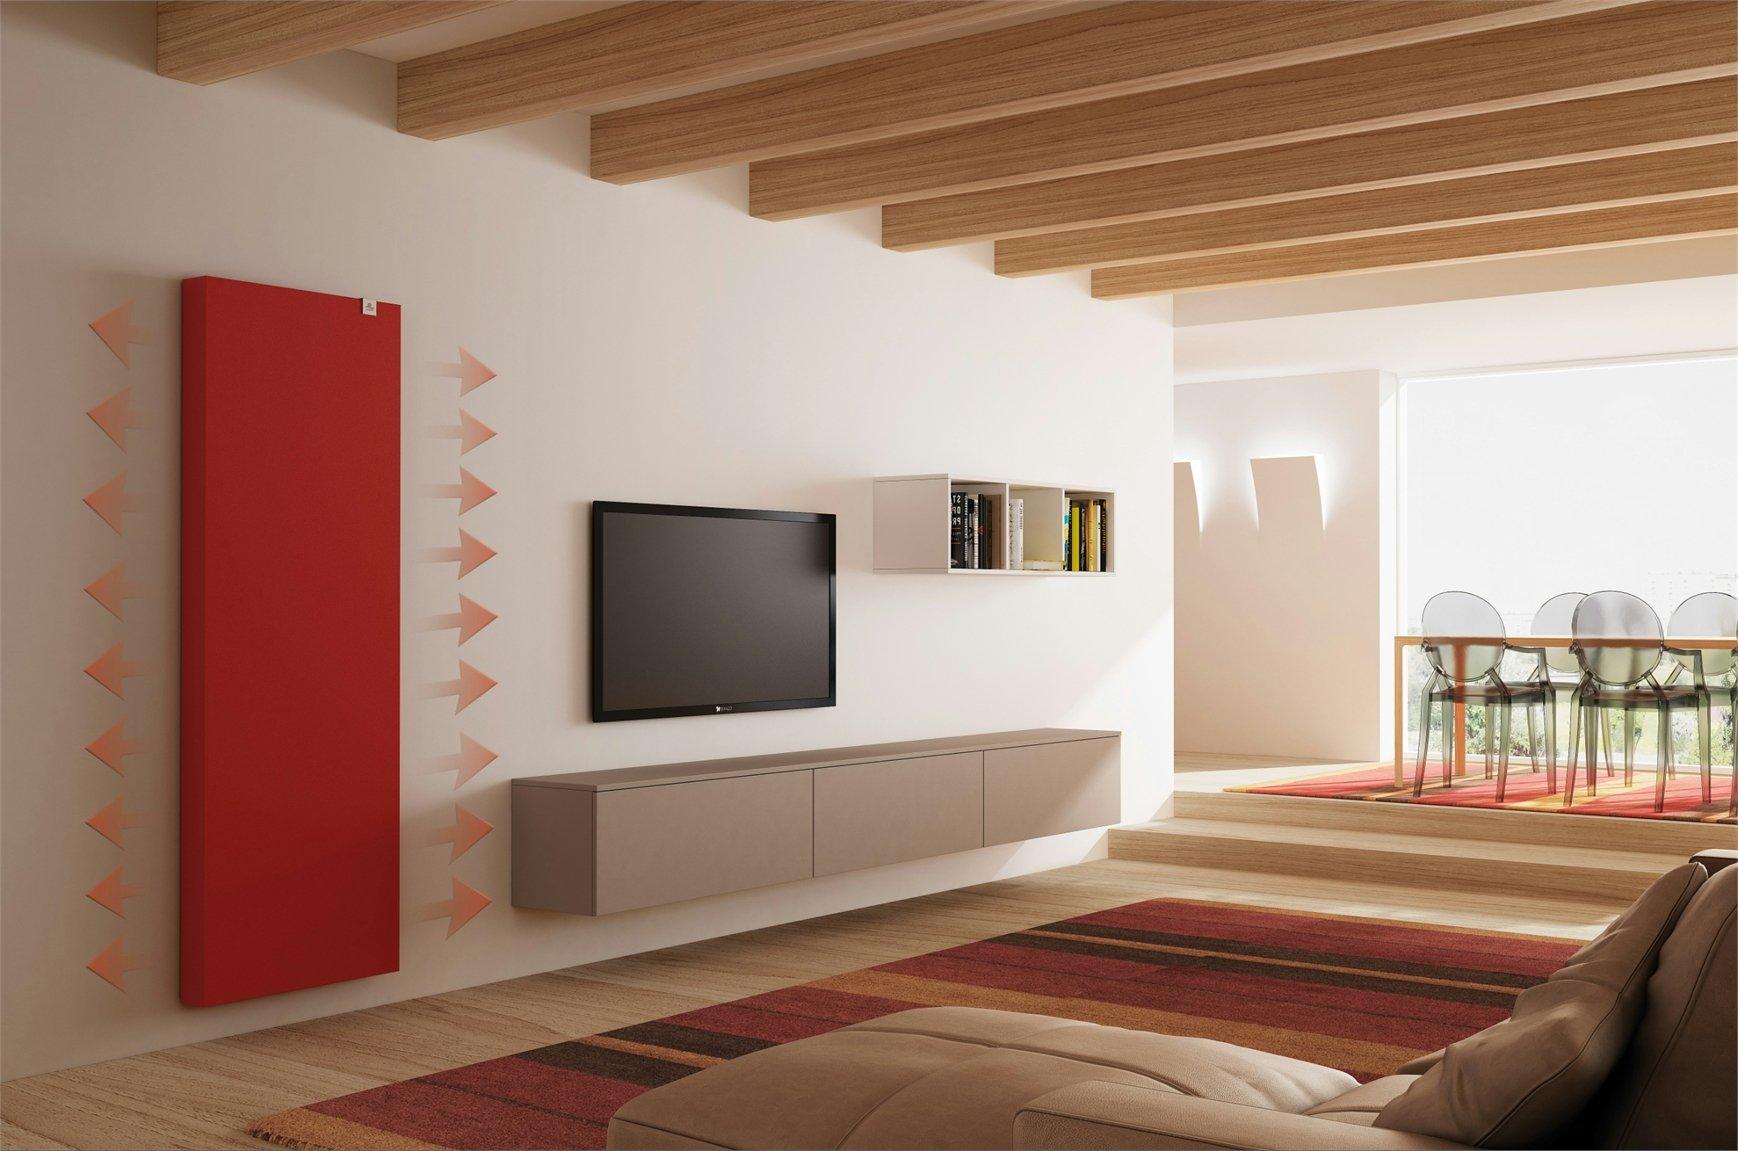 I radiatori irsap dal design ricercato for Radiatori a piastra